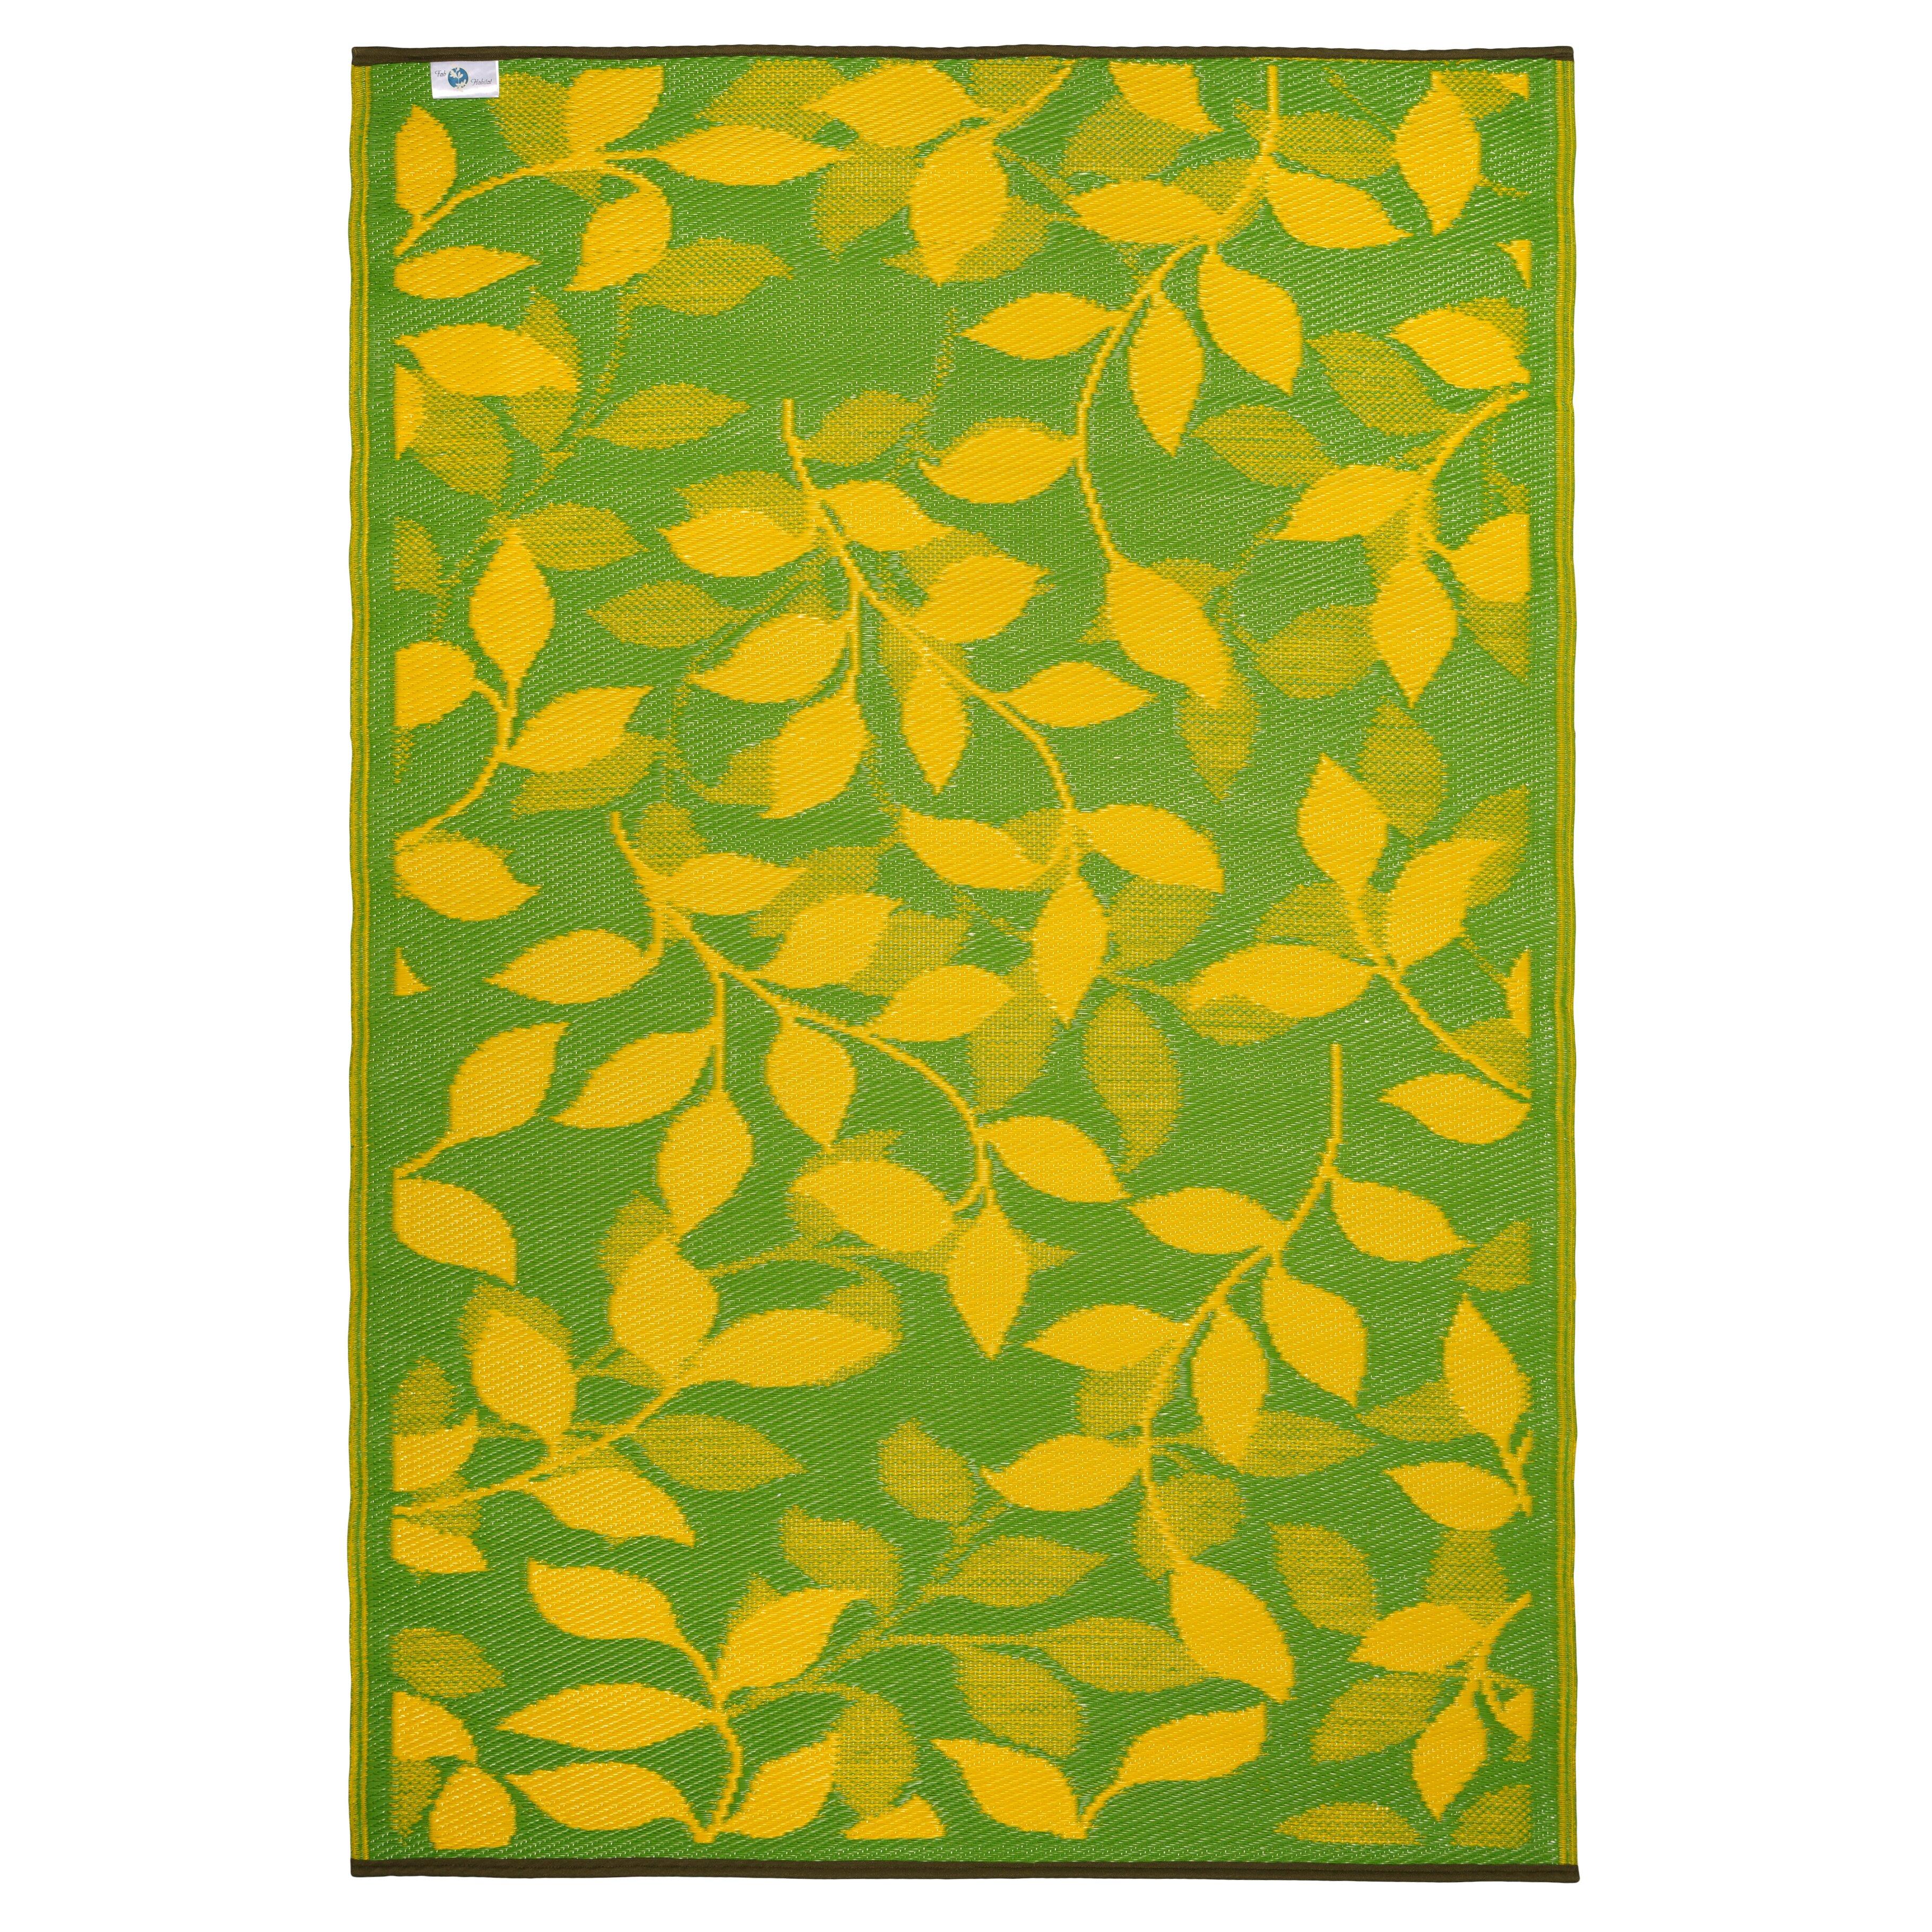 Fab Rugs World Bali Lemon Yellow Moss Green Indoor Outdoor